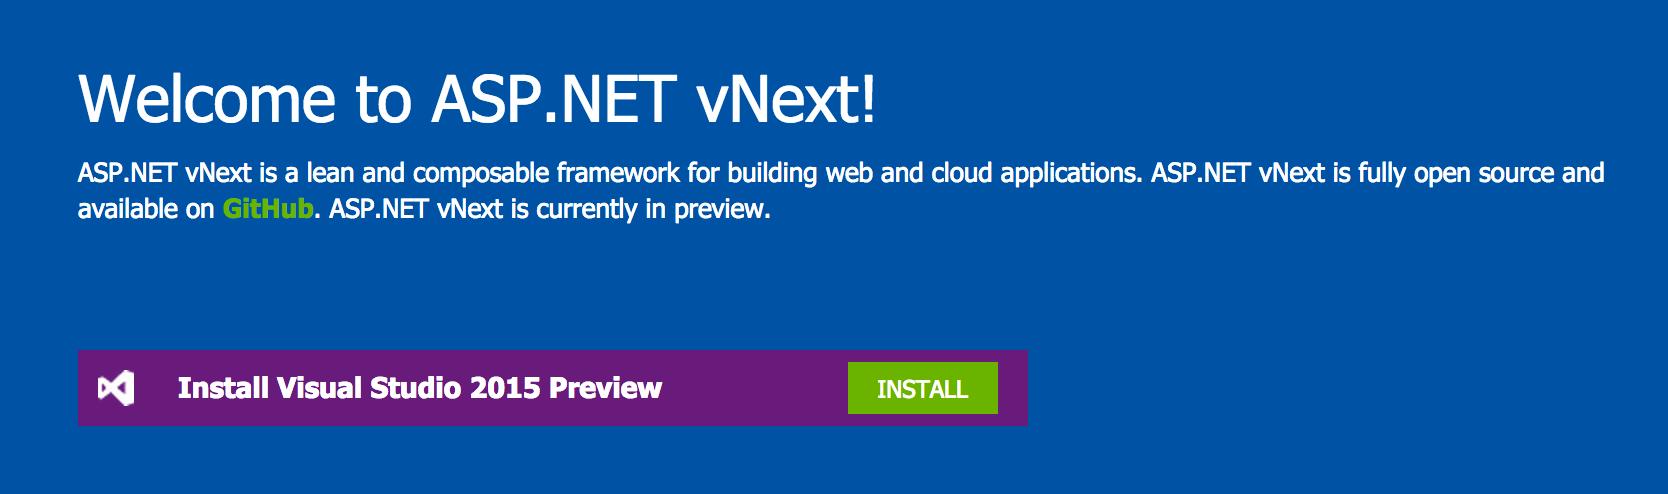 asp.net mvc中实现Forms身份验证身份验证流程的实例